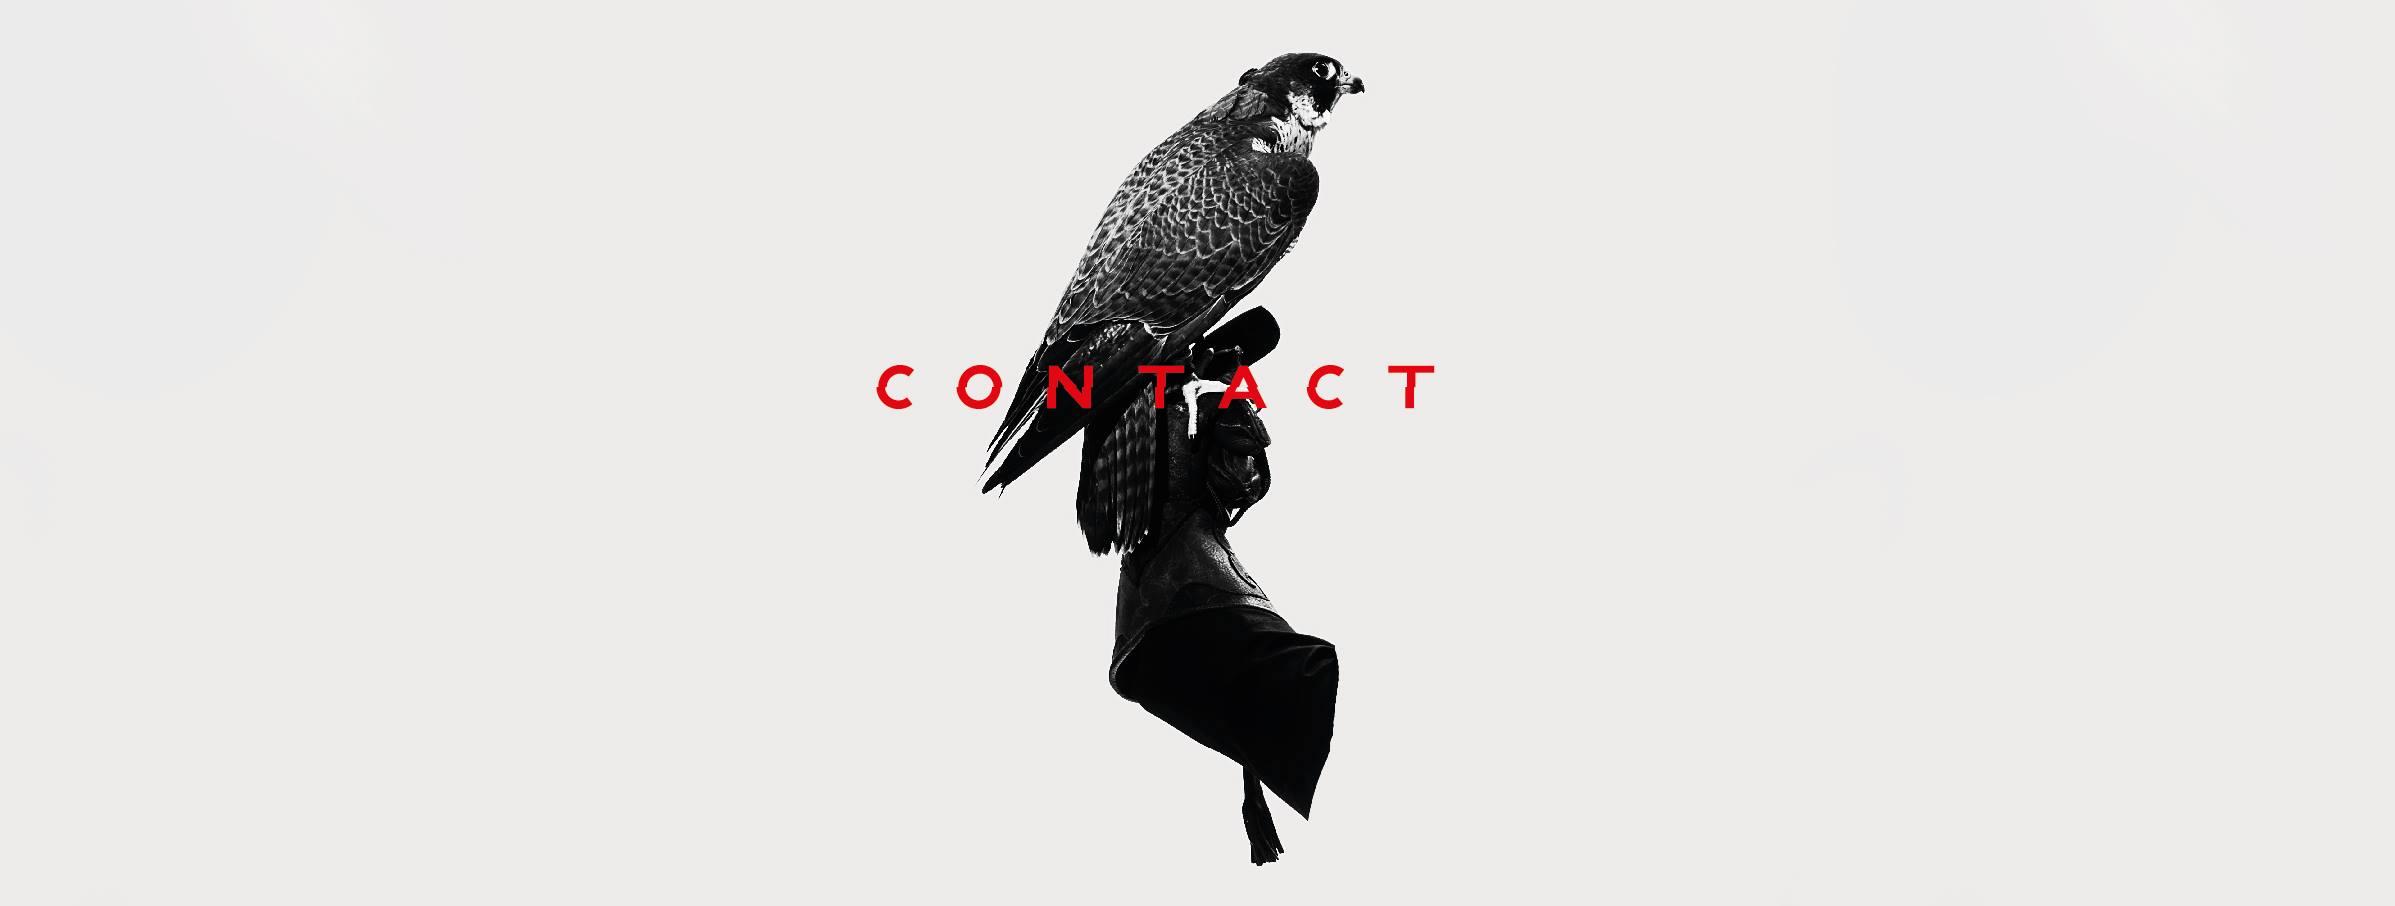 SOKOL - ContactMusic Video - Switzerland 2015